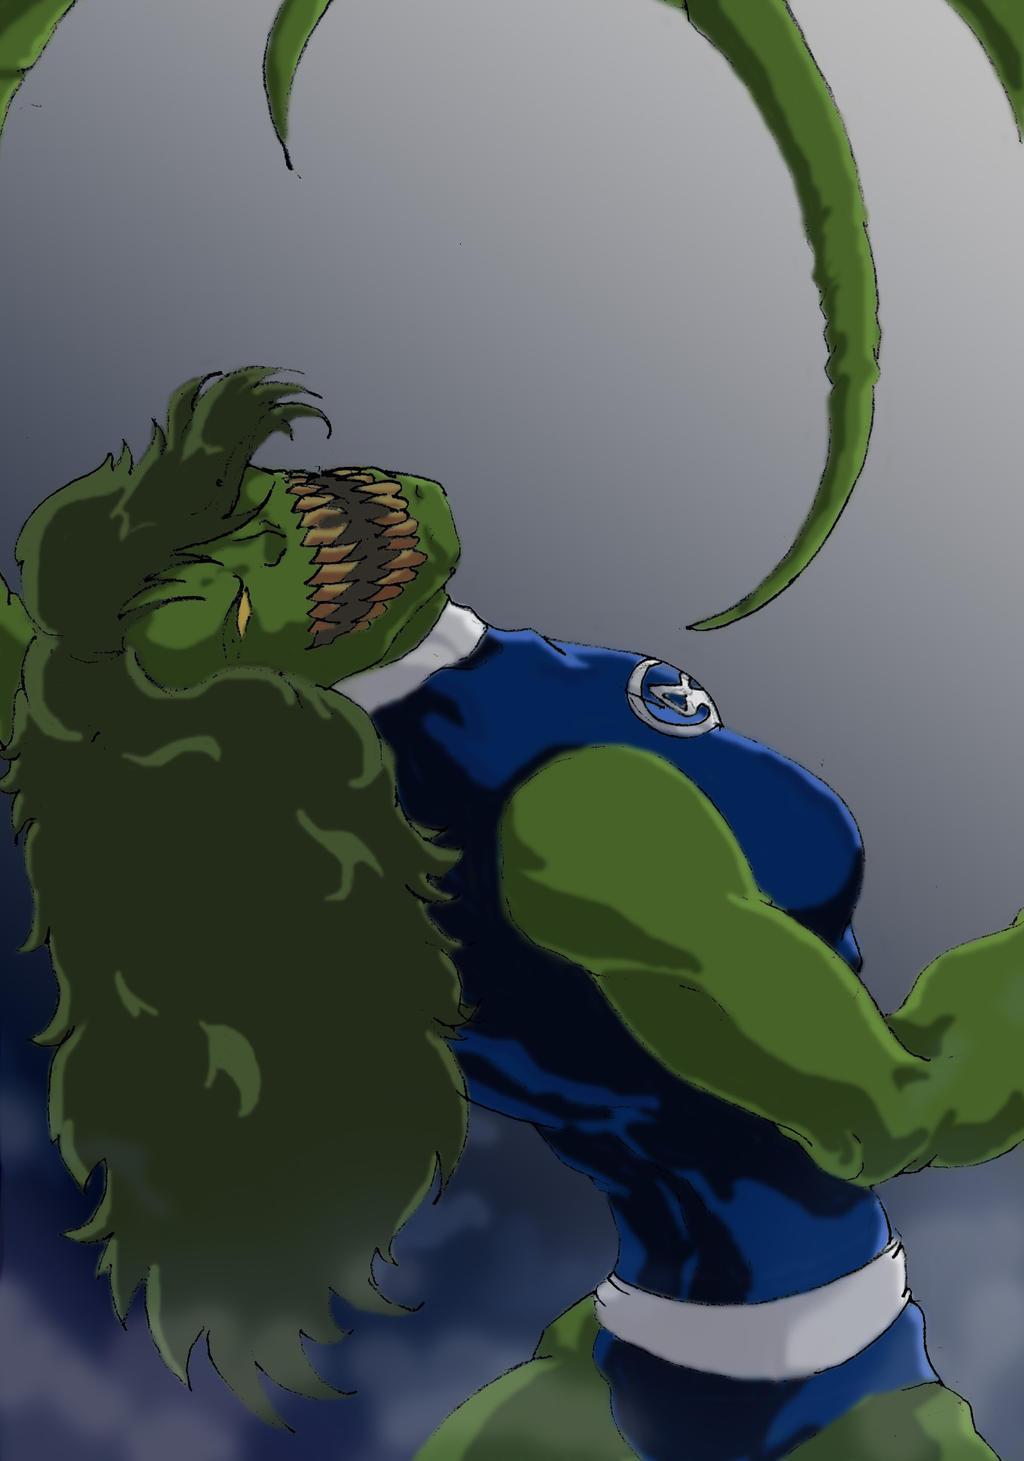 Venom She Hulk She-hulk is a brood by